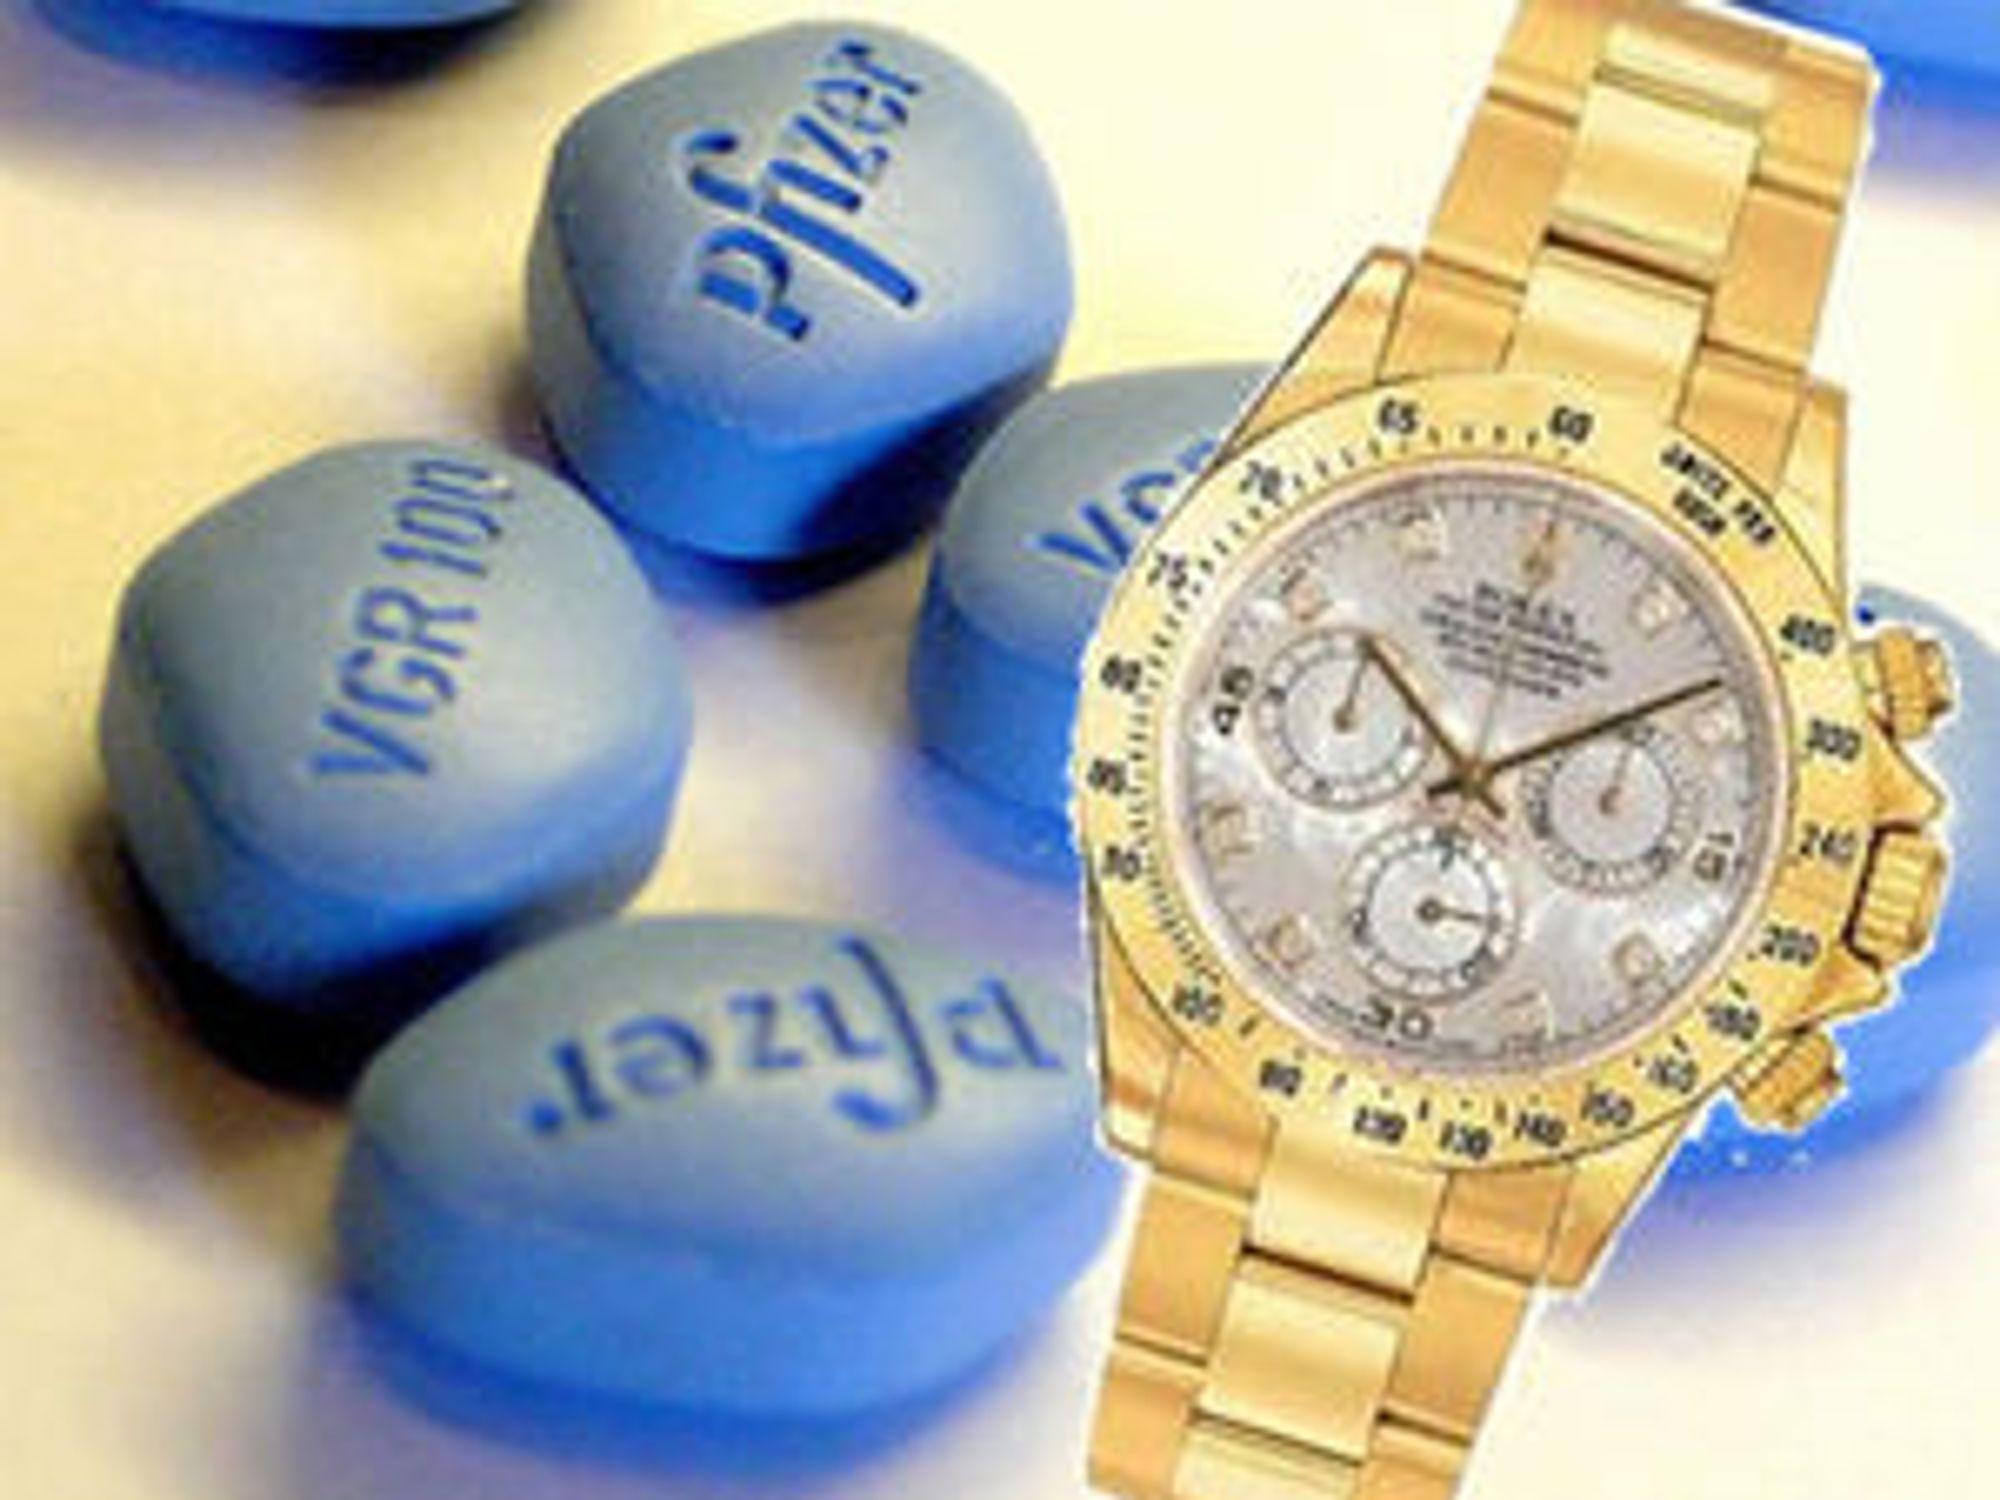 Mega-D solgte alt fra falsk Viagra til falske Rolex-ur, og kunne ifølge MessageLabs spy ut 38,2 milliarder e-postmeldinger per dag.